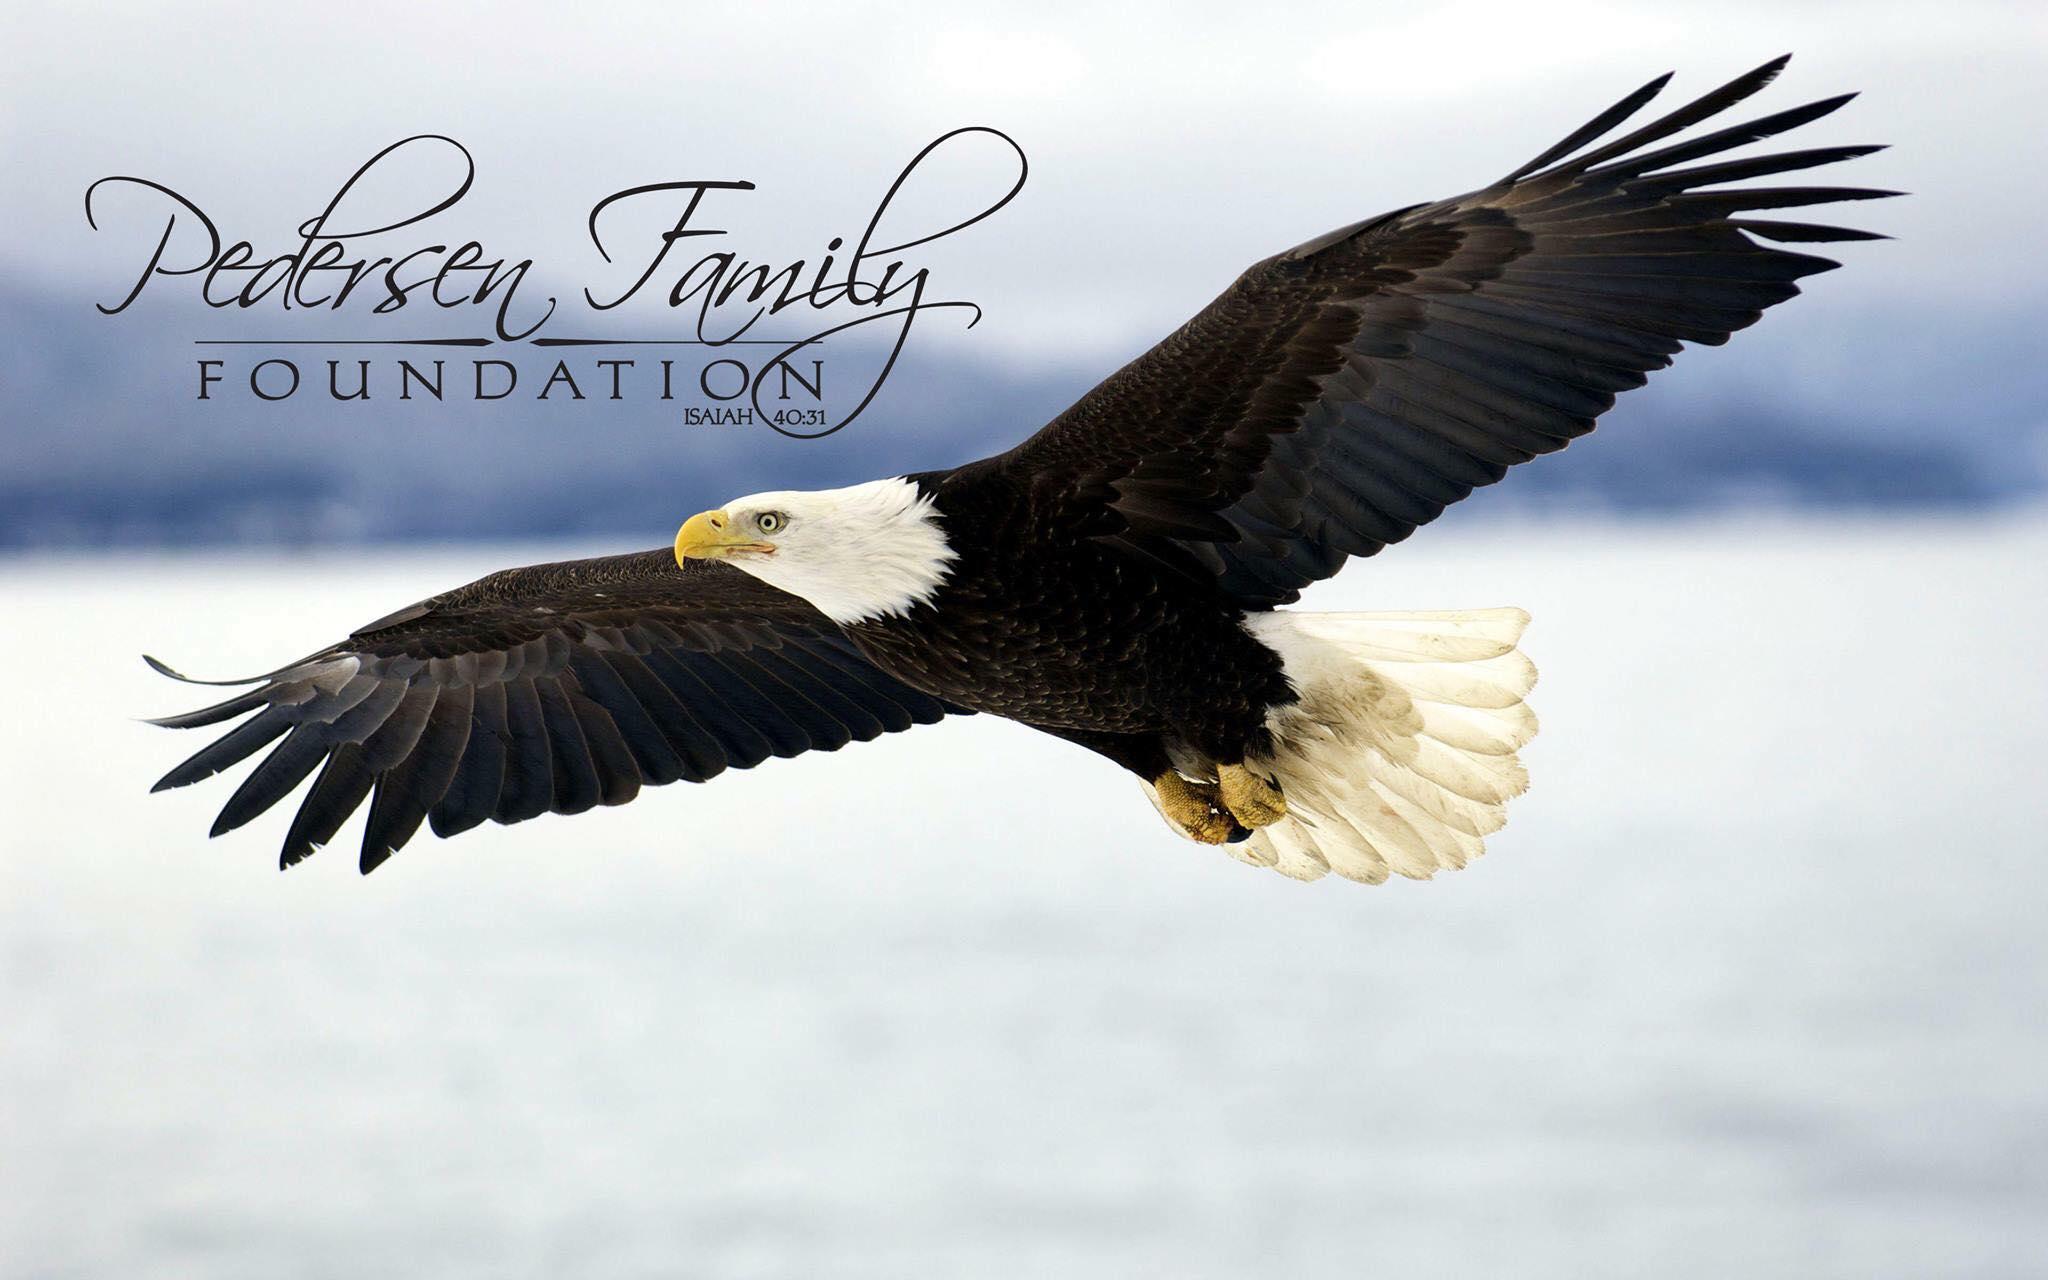 pedersen family foundation